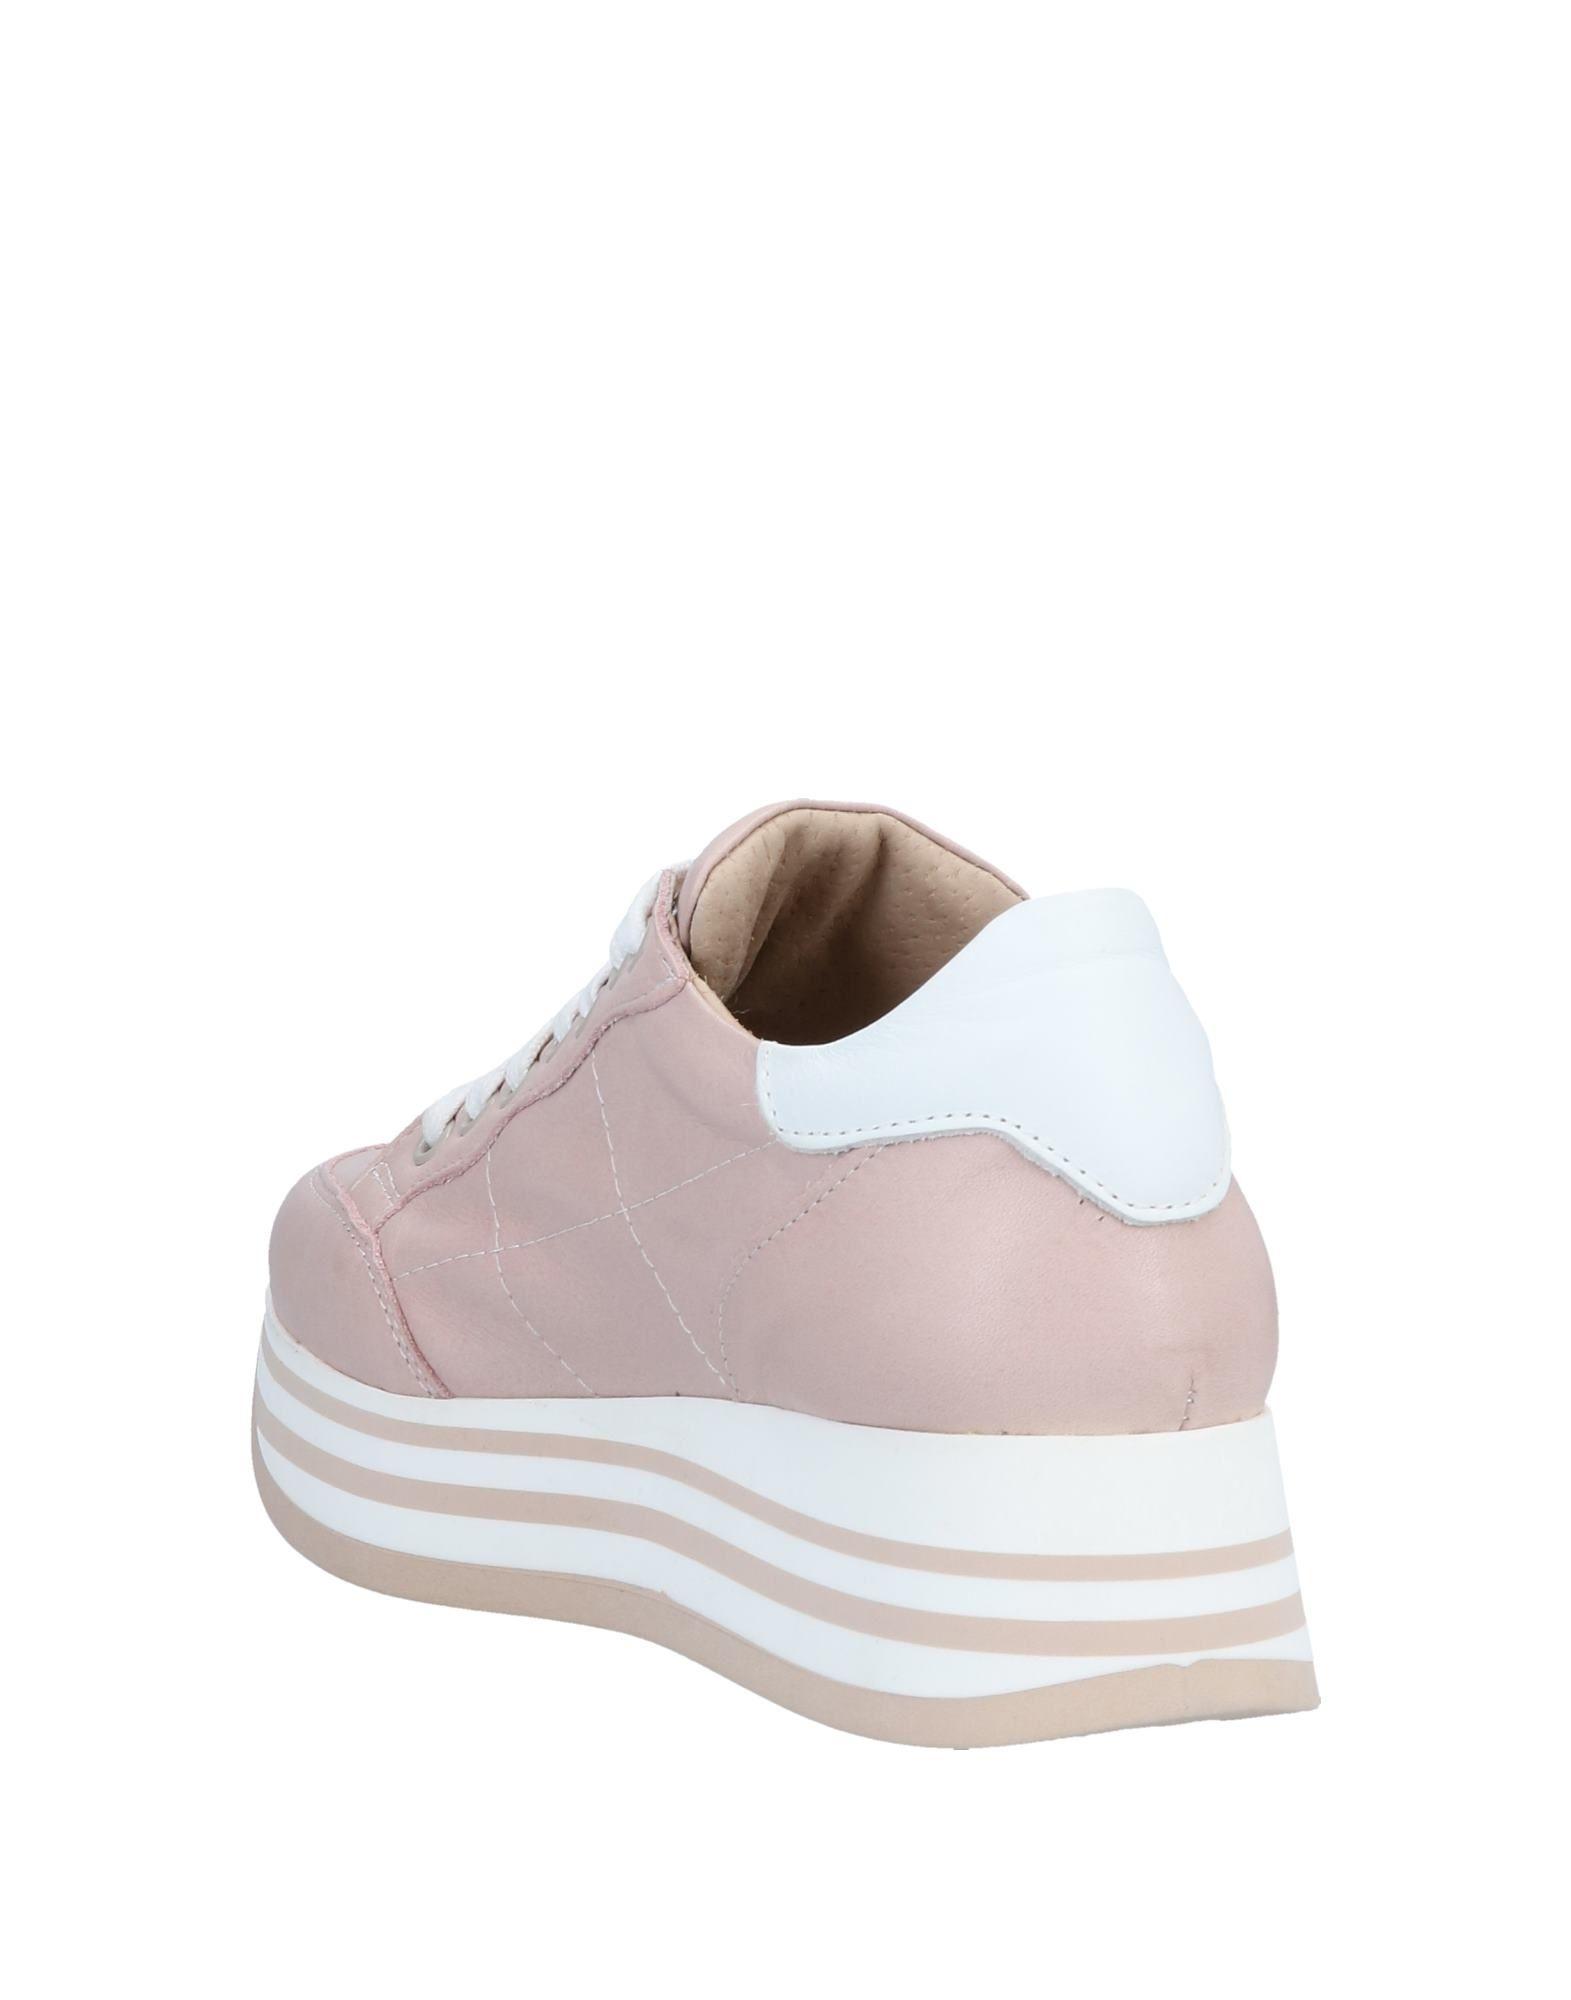 Loretta Pettinari Sneakers lohnt Damen Gutes Preis-Leistungs-Verhältnis, es lohnt Sneakers sich 1492 de2937